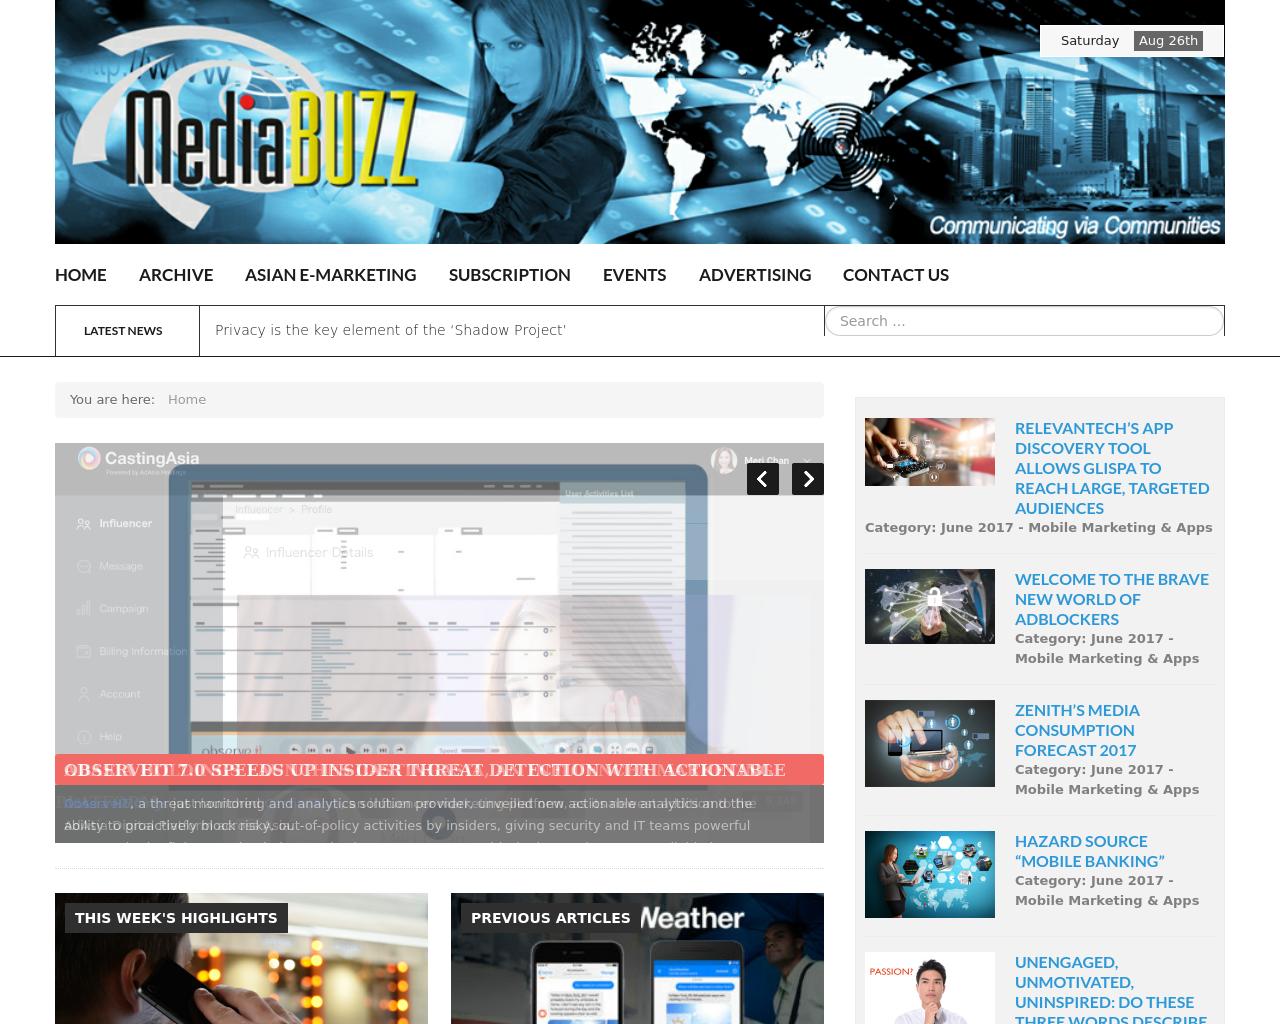 MediaBUZZ-Advertising-Reviews-Pricing